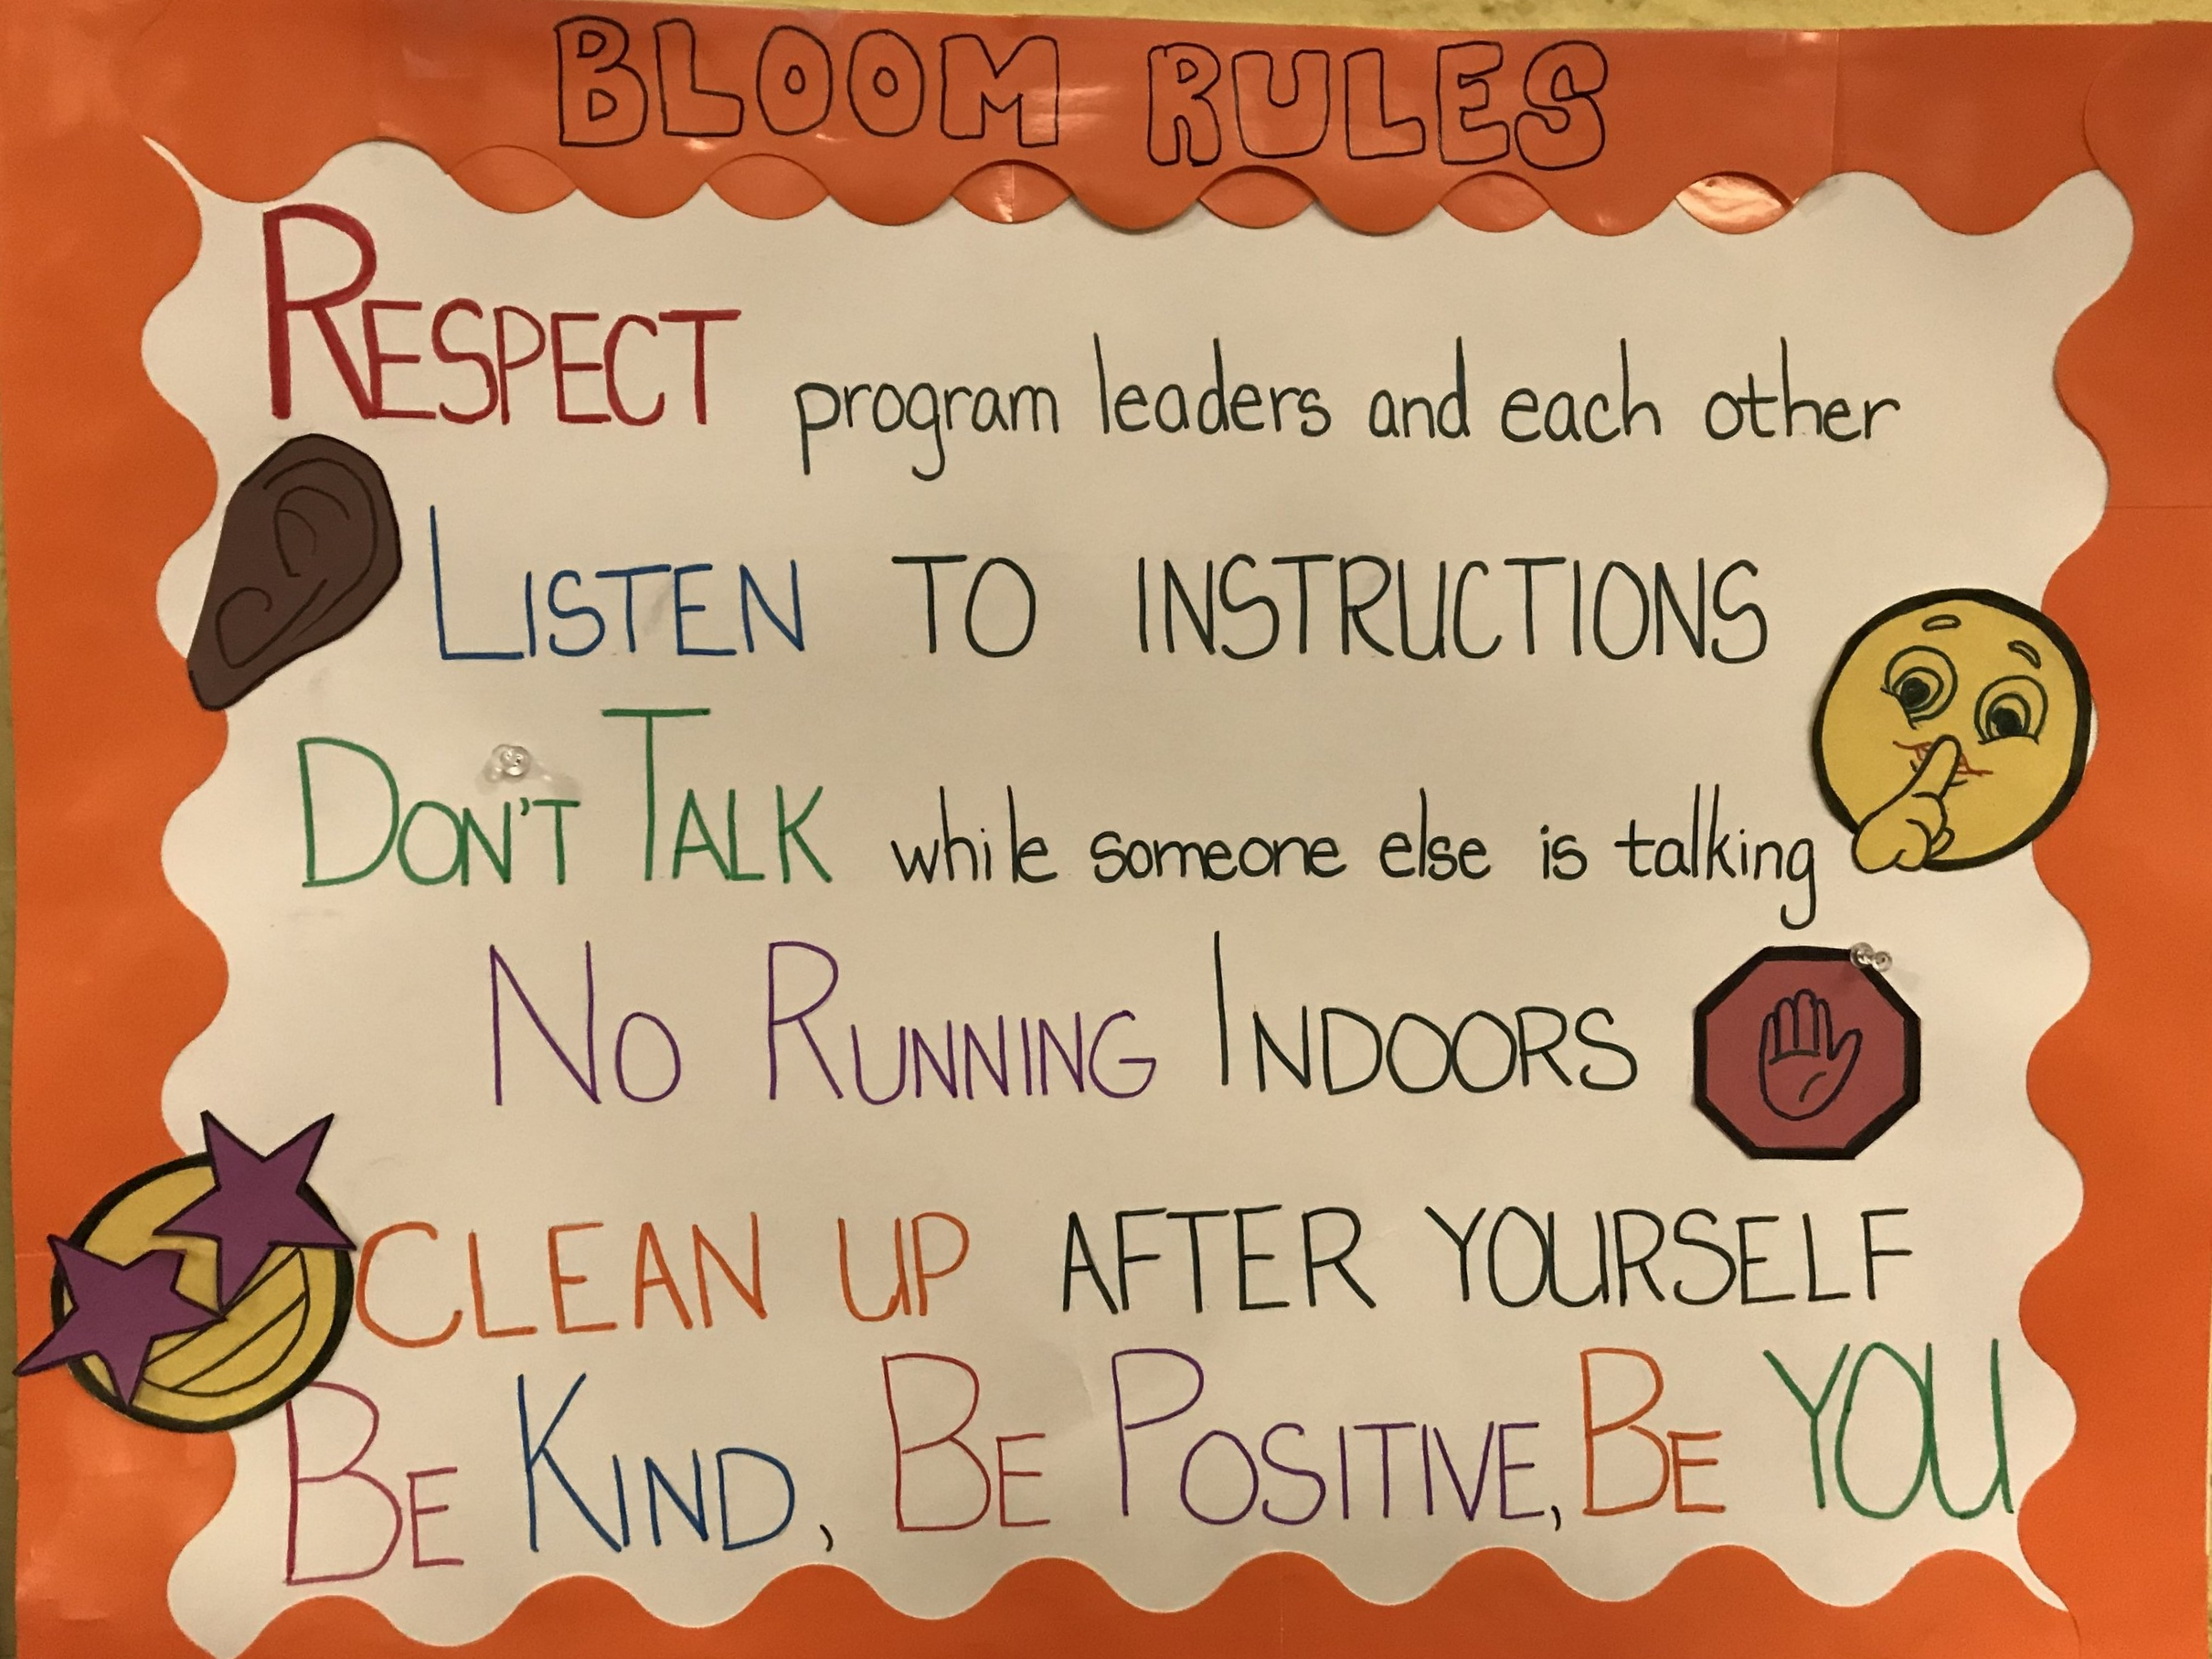 BLOOM Rules